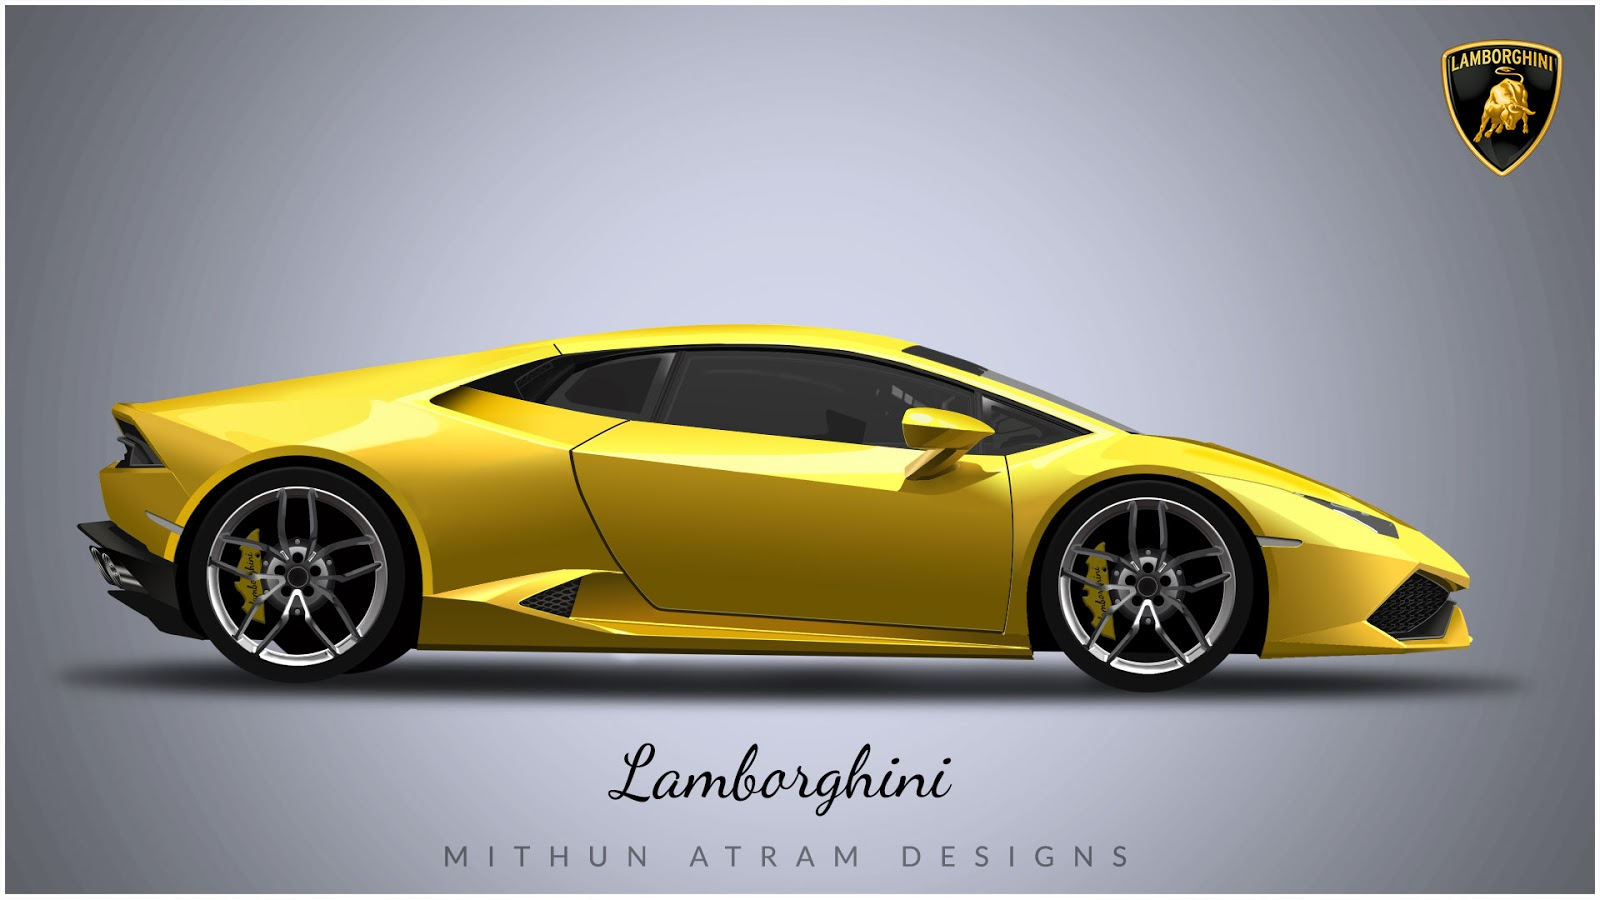 Lamborghini In Photoshop Mithun Atram Designs